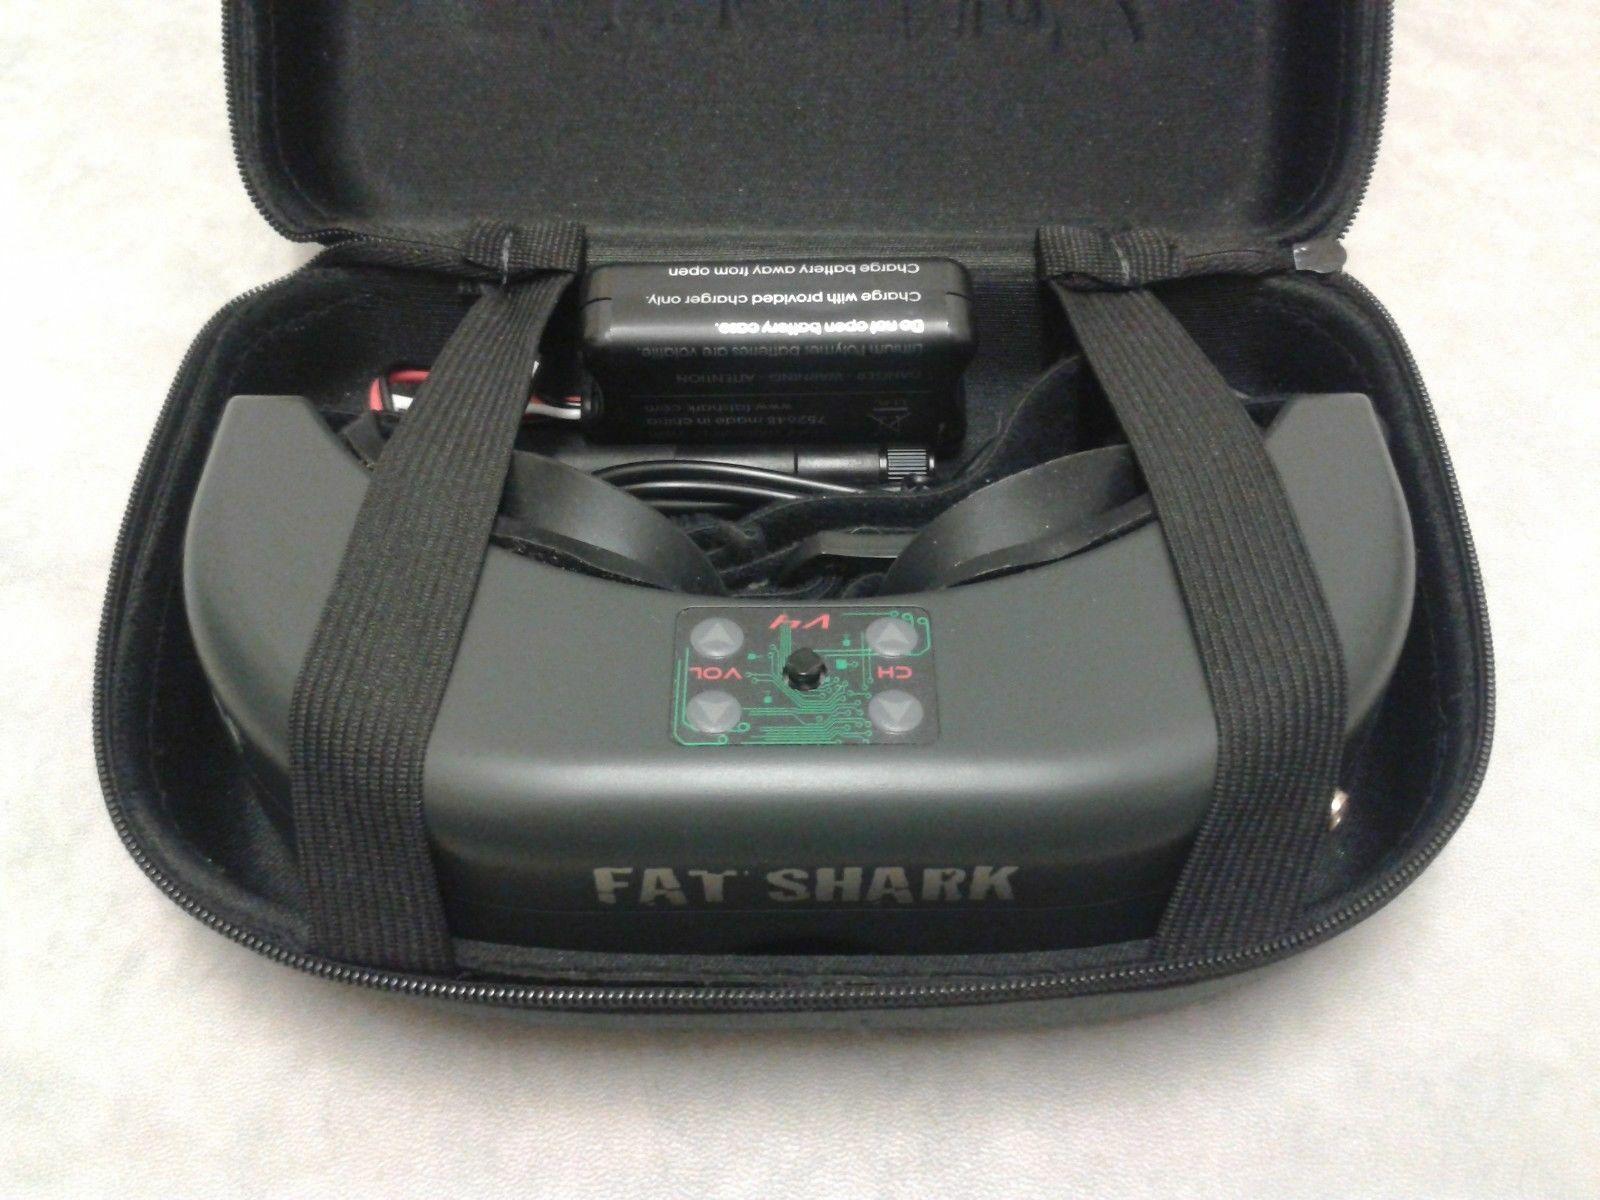 FatShark Teleporter Horizon Hobby V4 Fpv Gafas 5.8GHz RC Cuadricóptero Drone